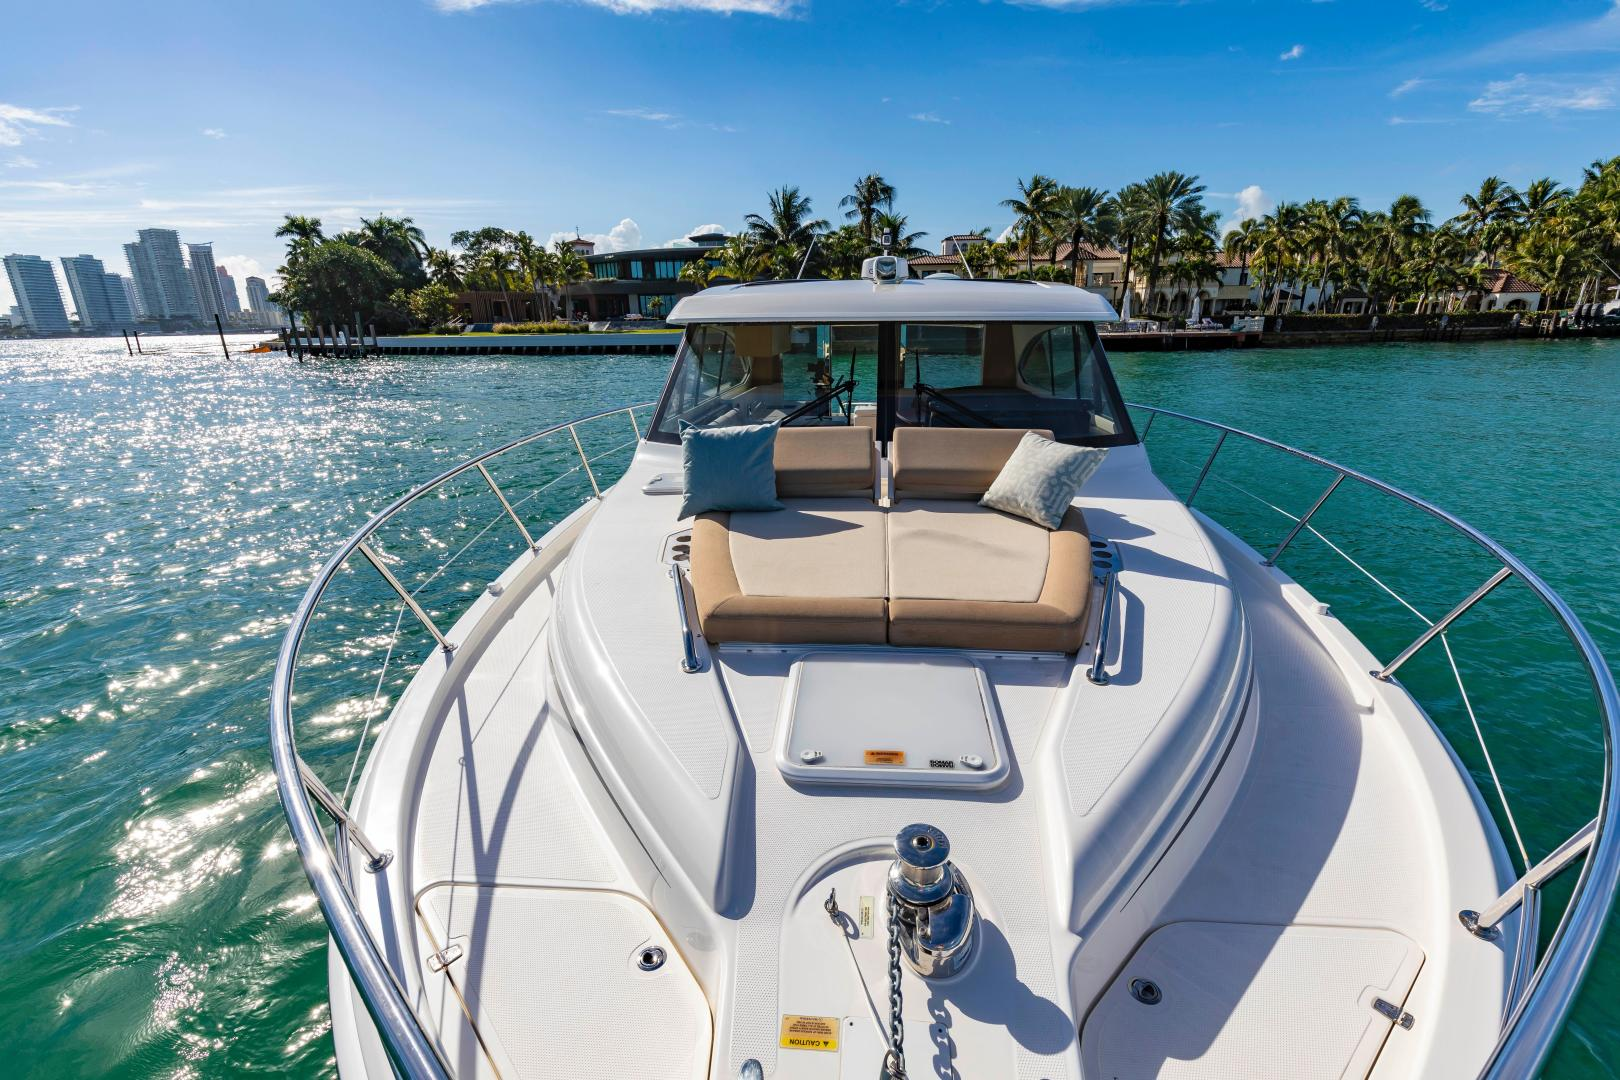 Riviera-395 SUV 2019-Ipanema Miami Beach-Florida-United States-1614877   Thumbnail